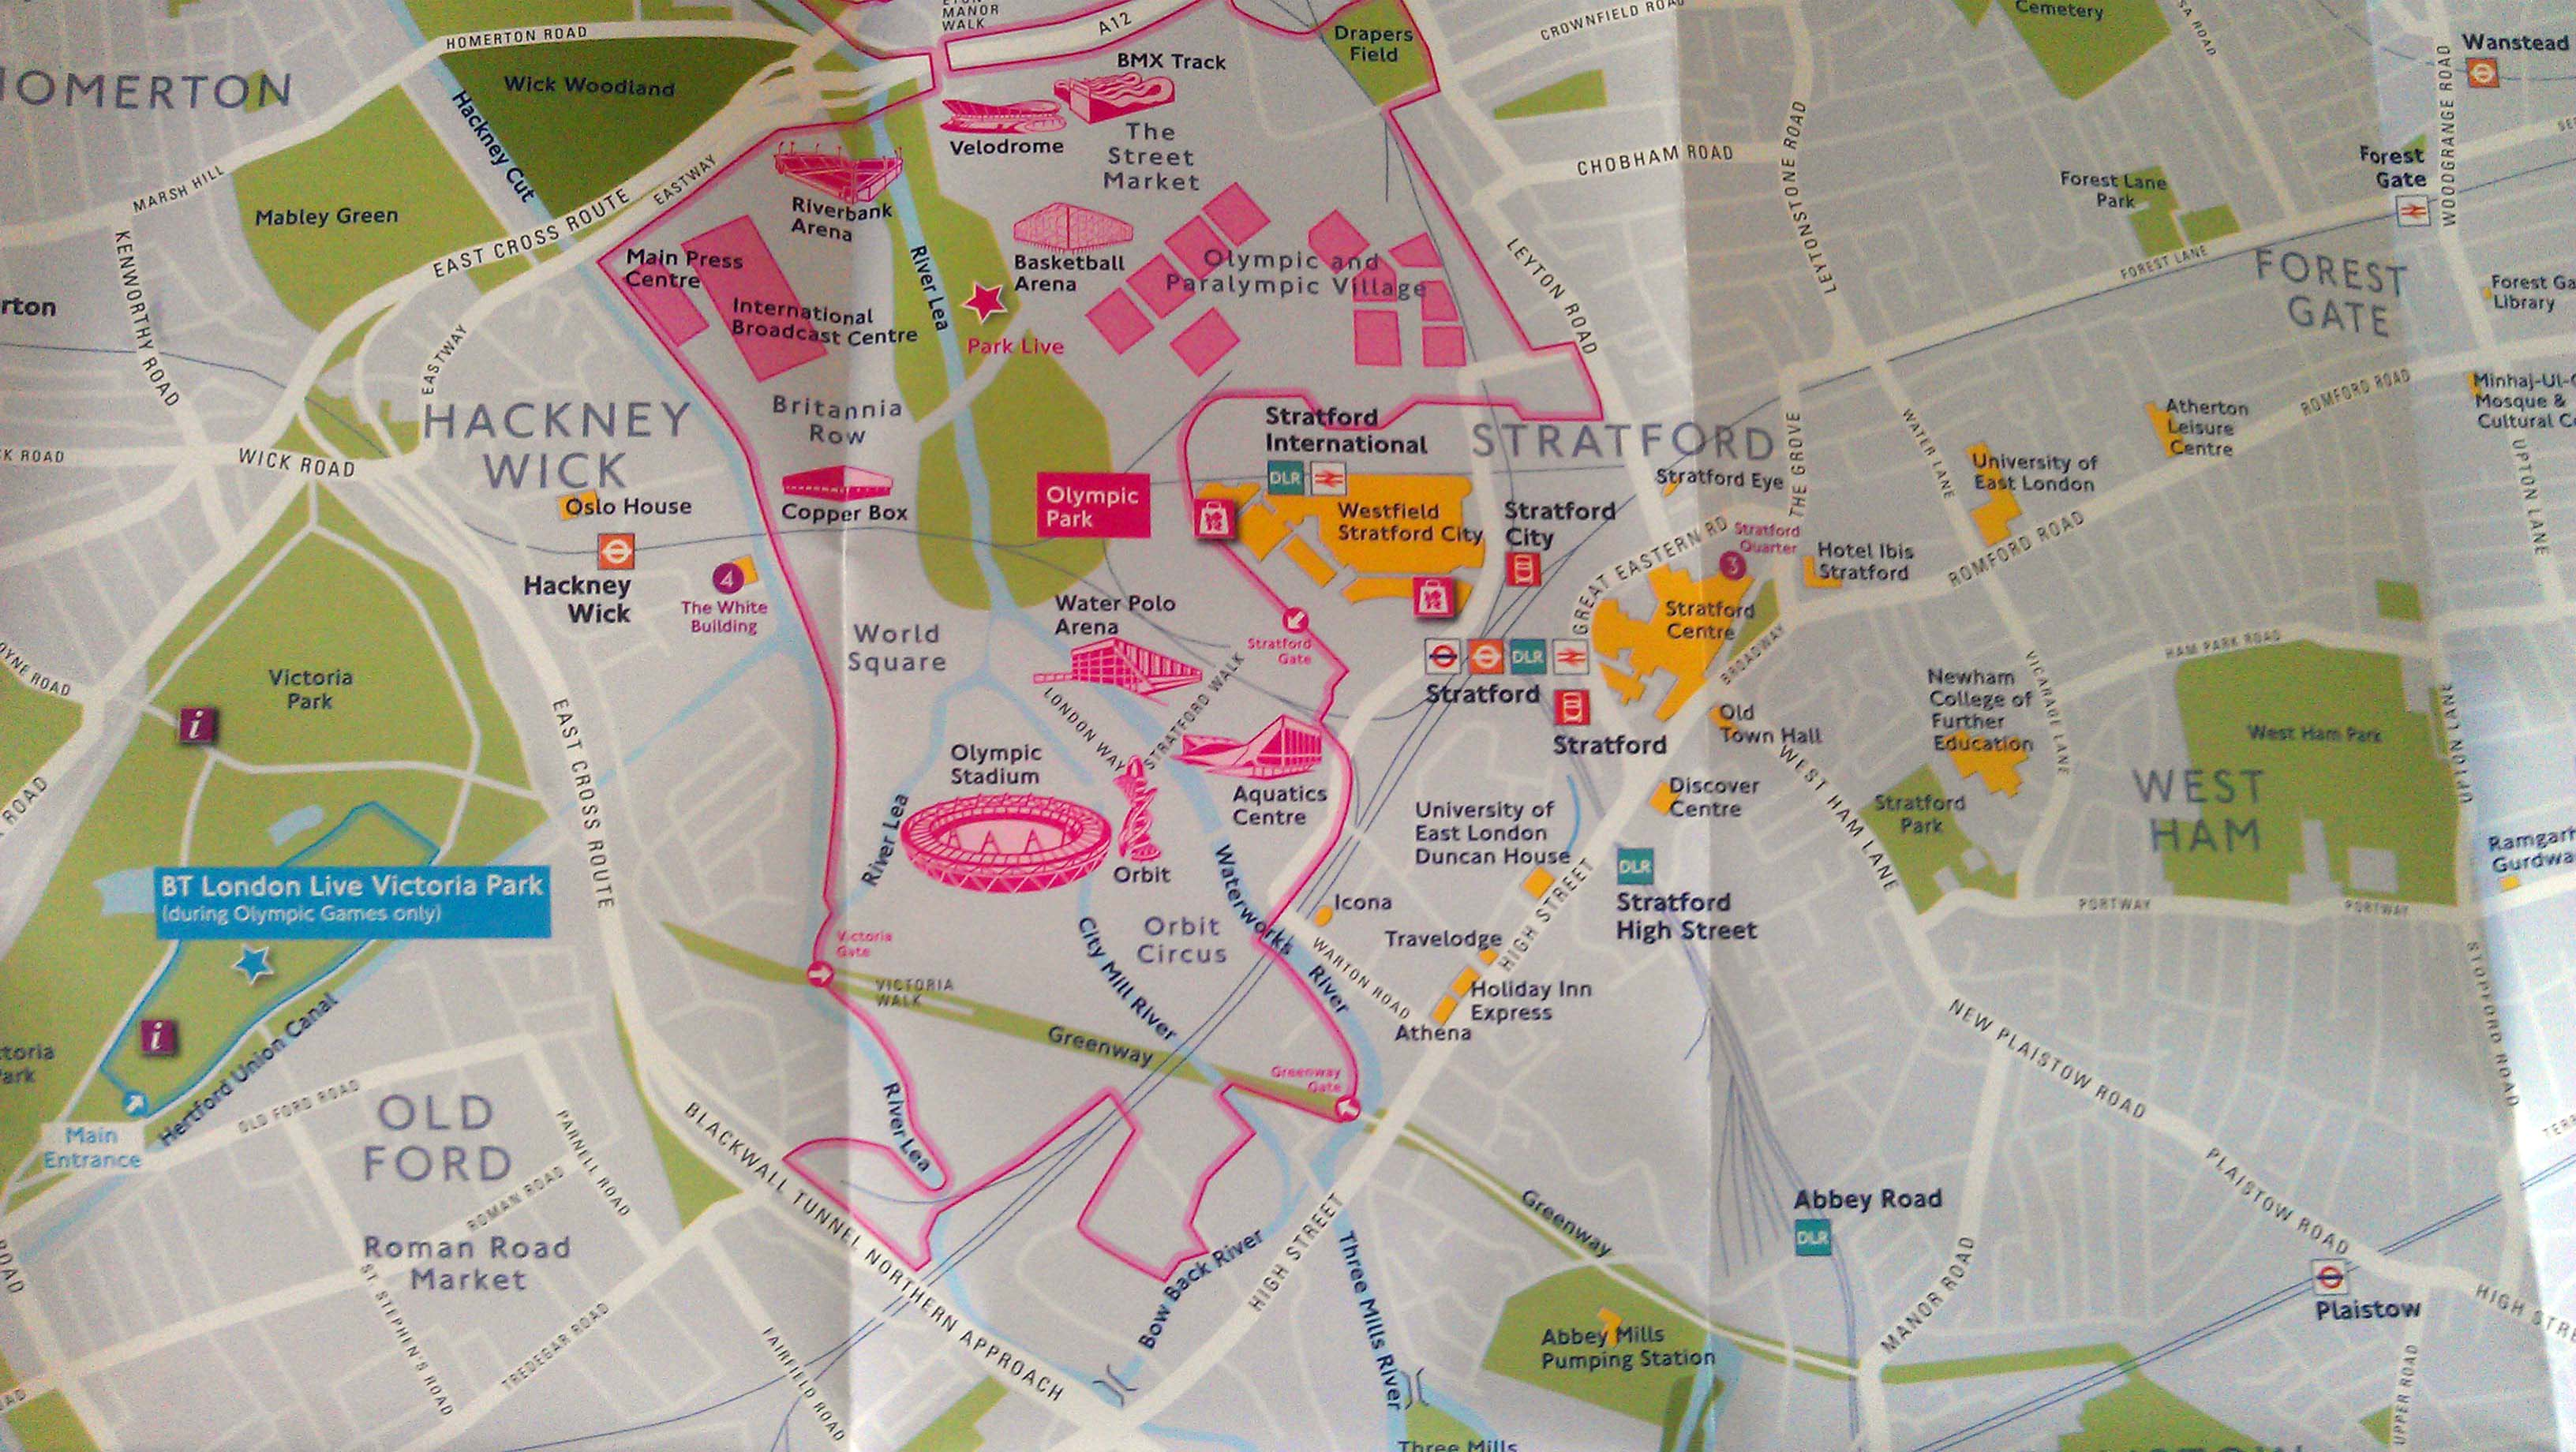 Summer 2012 Map – Map of Central London Landmarks